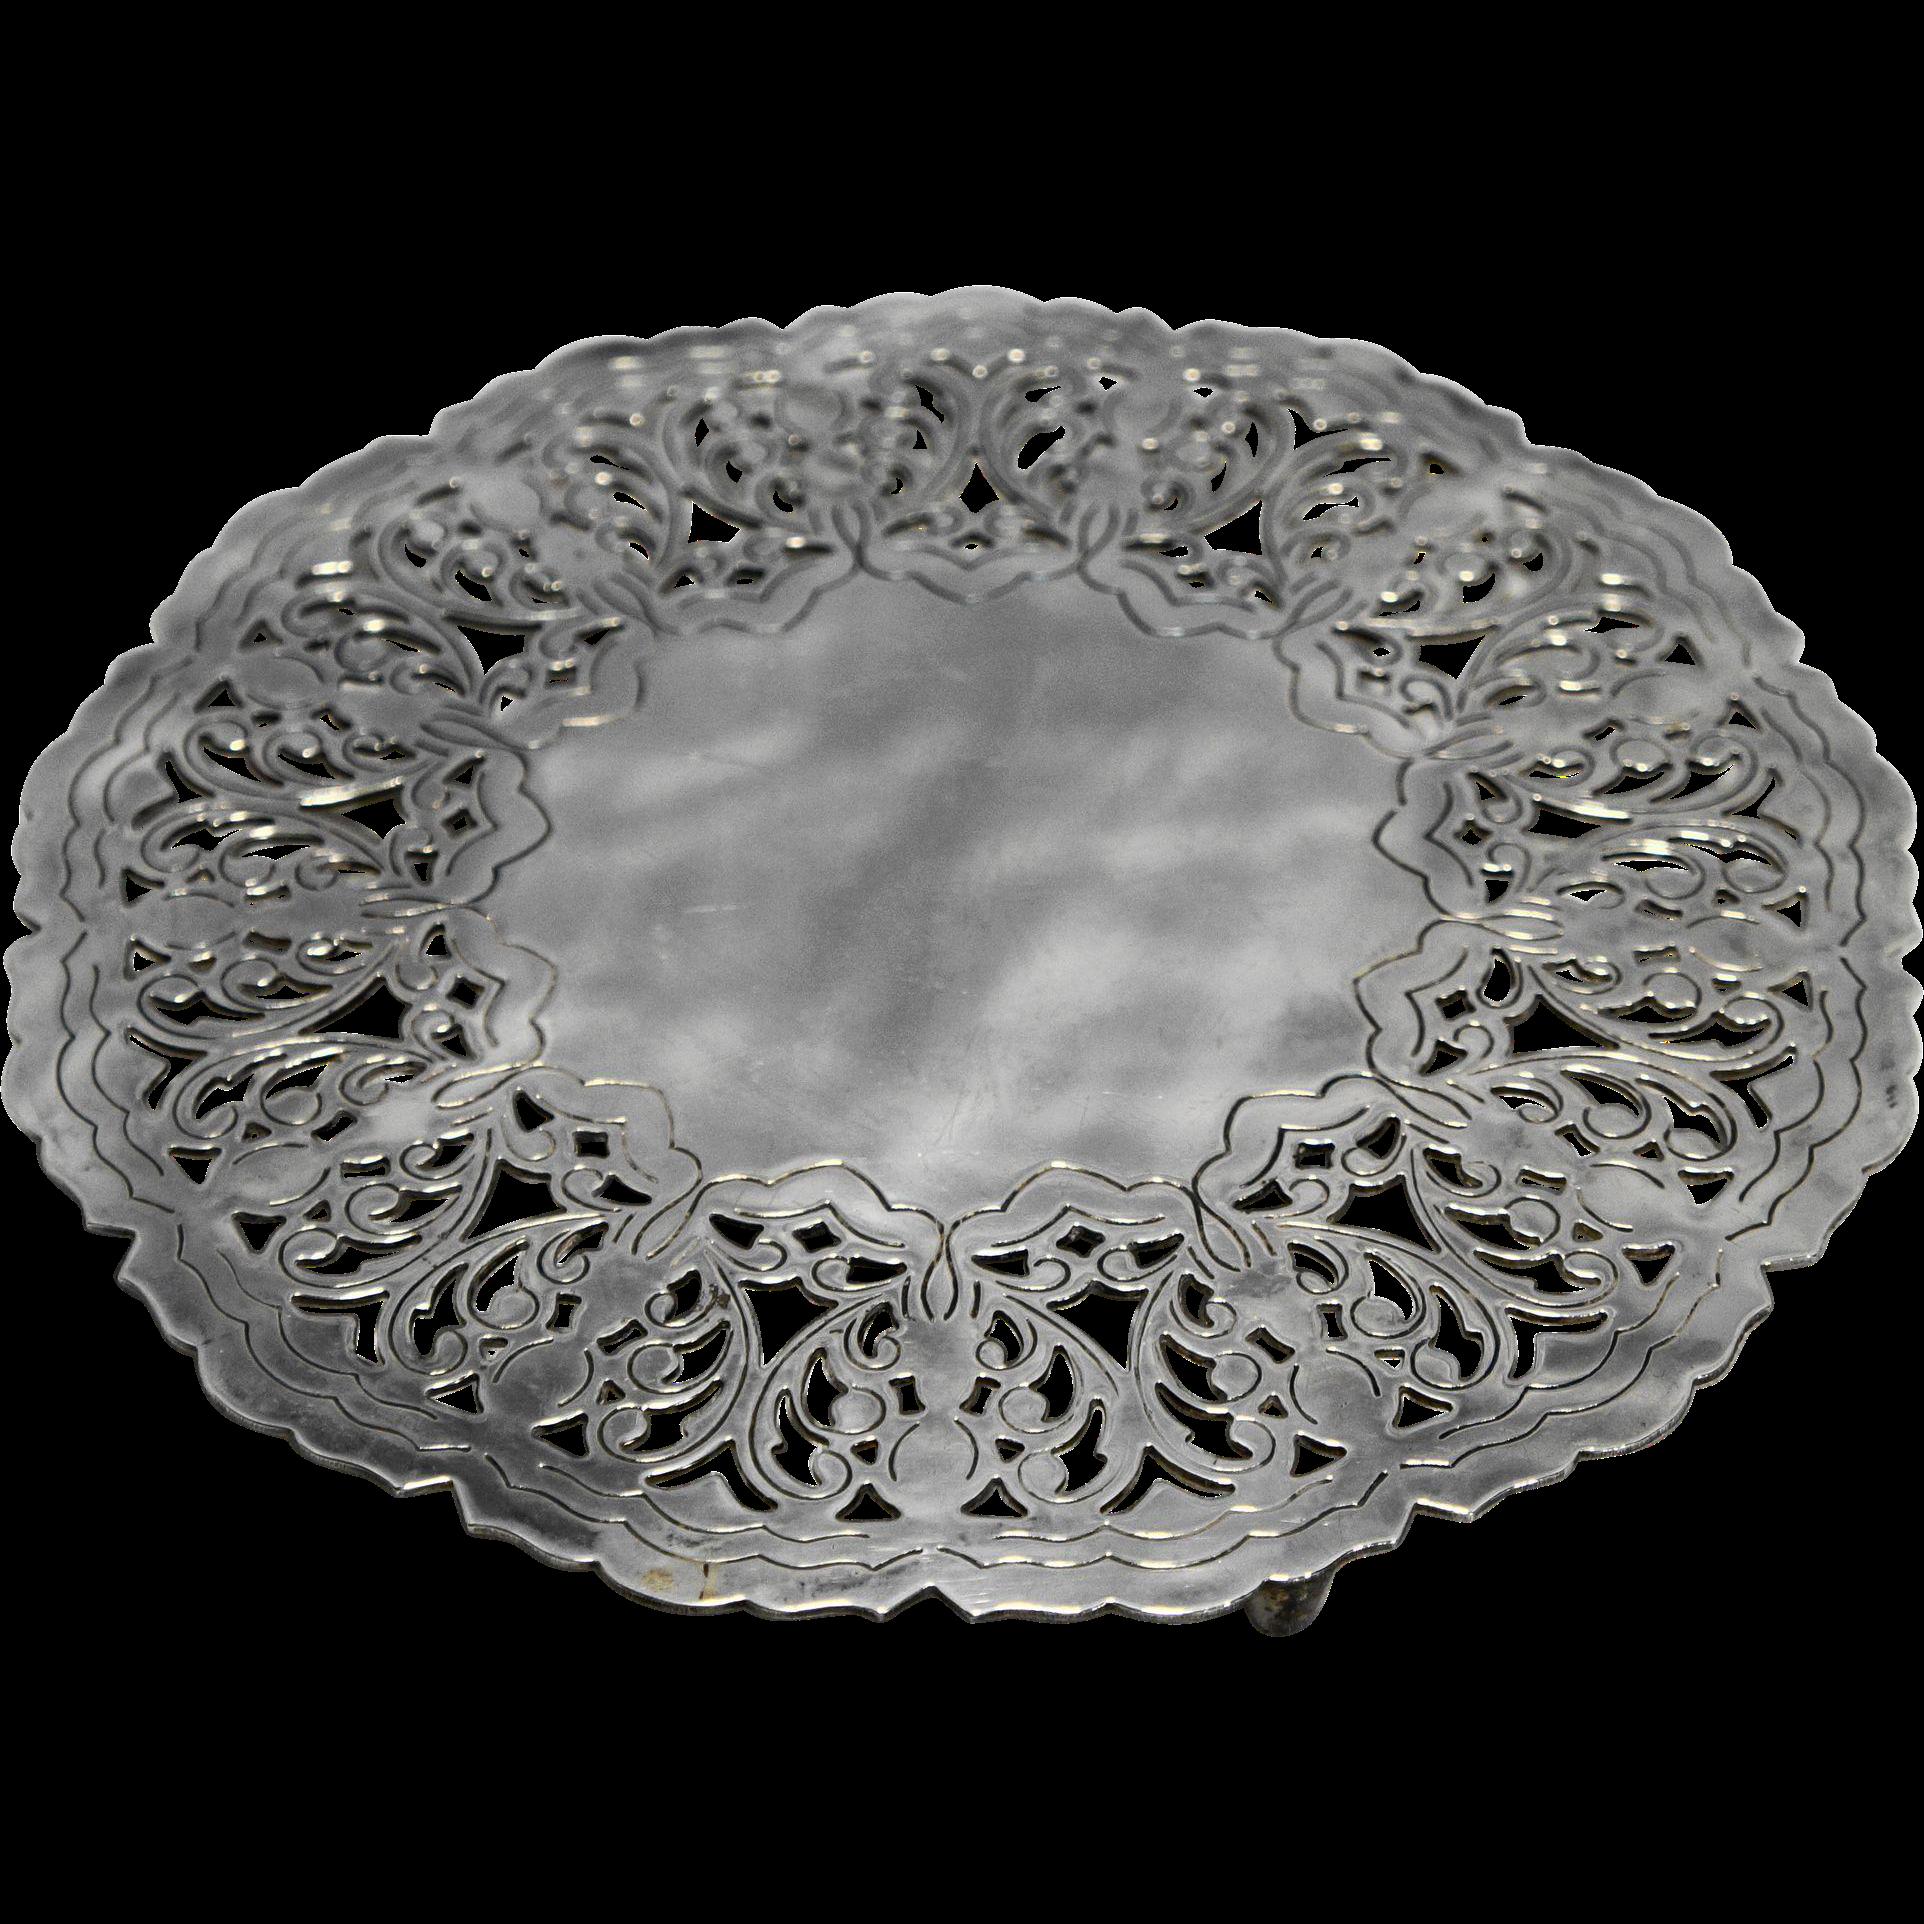 Silver Plated Trivet Pierced Scrolls Round 7 IN Made in Denmark